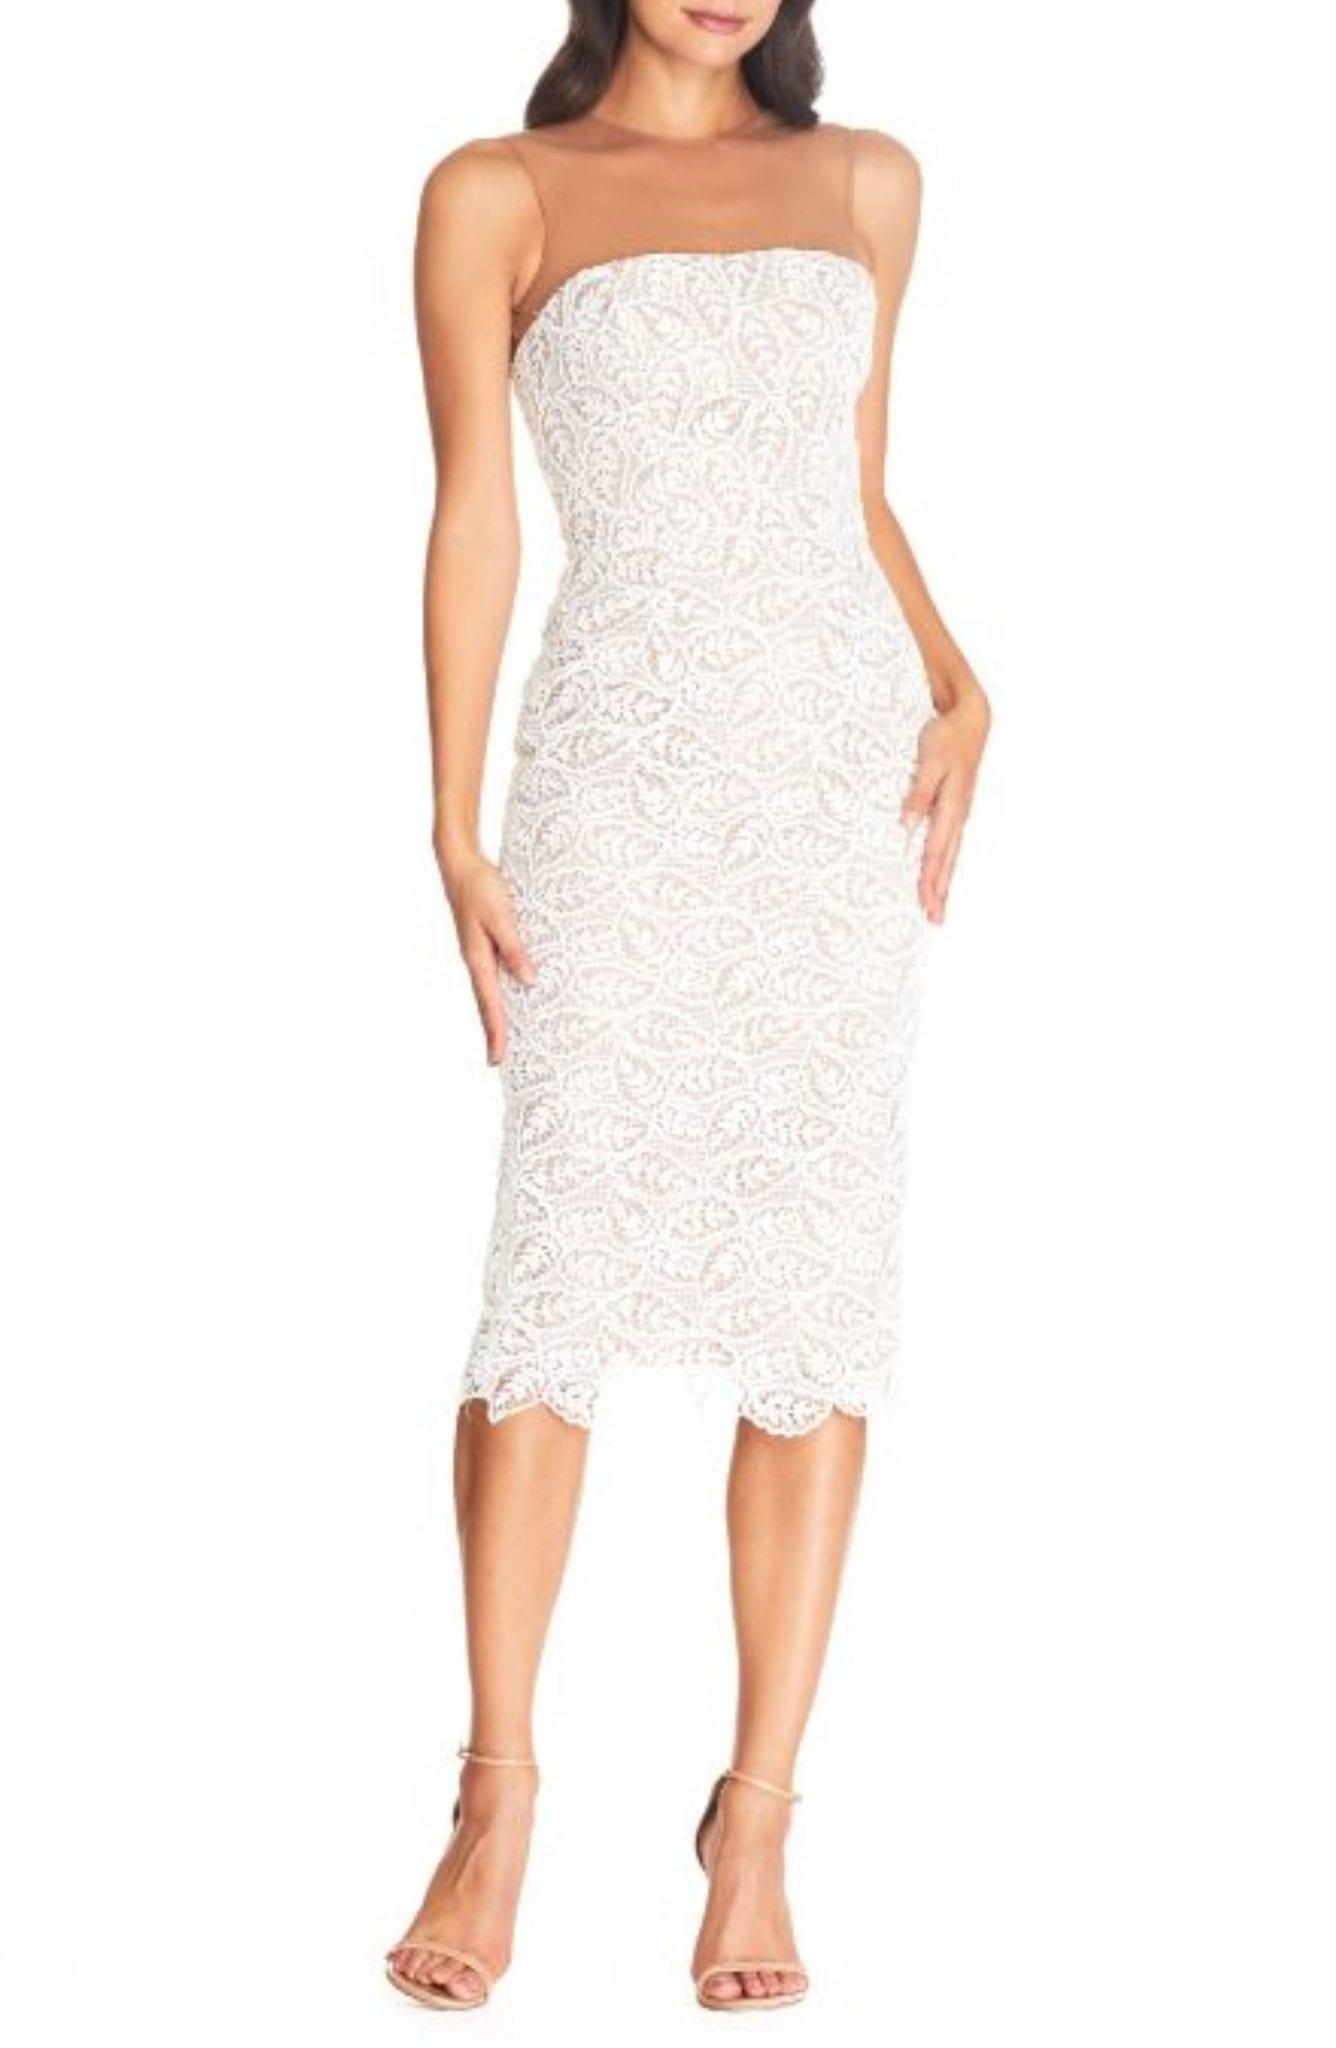 DRESS THE POPULATION Tegan Lace Strapless Bodycon Cocktail Dress